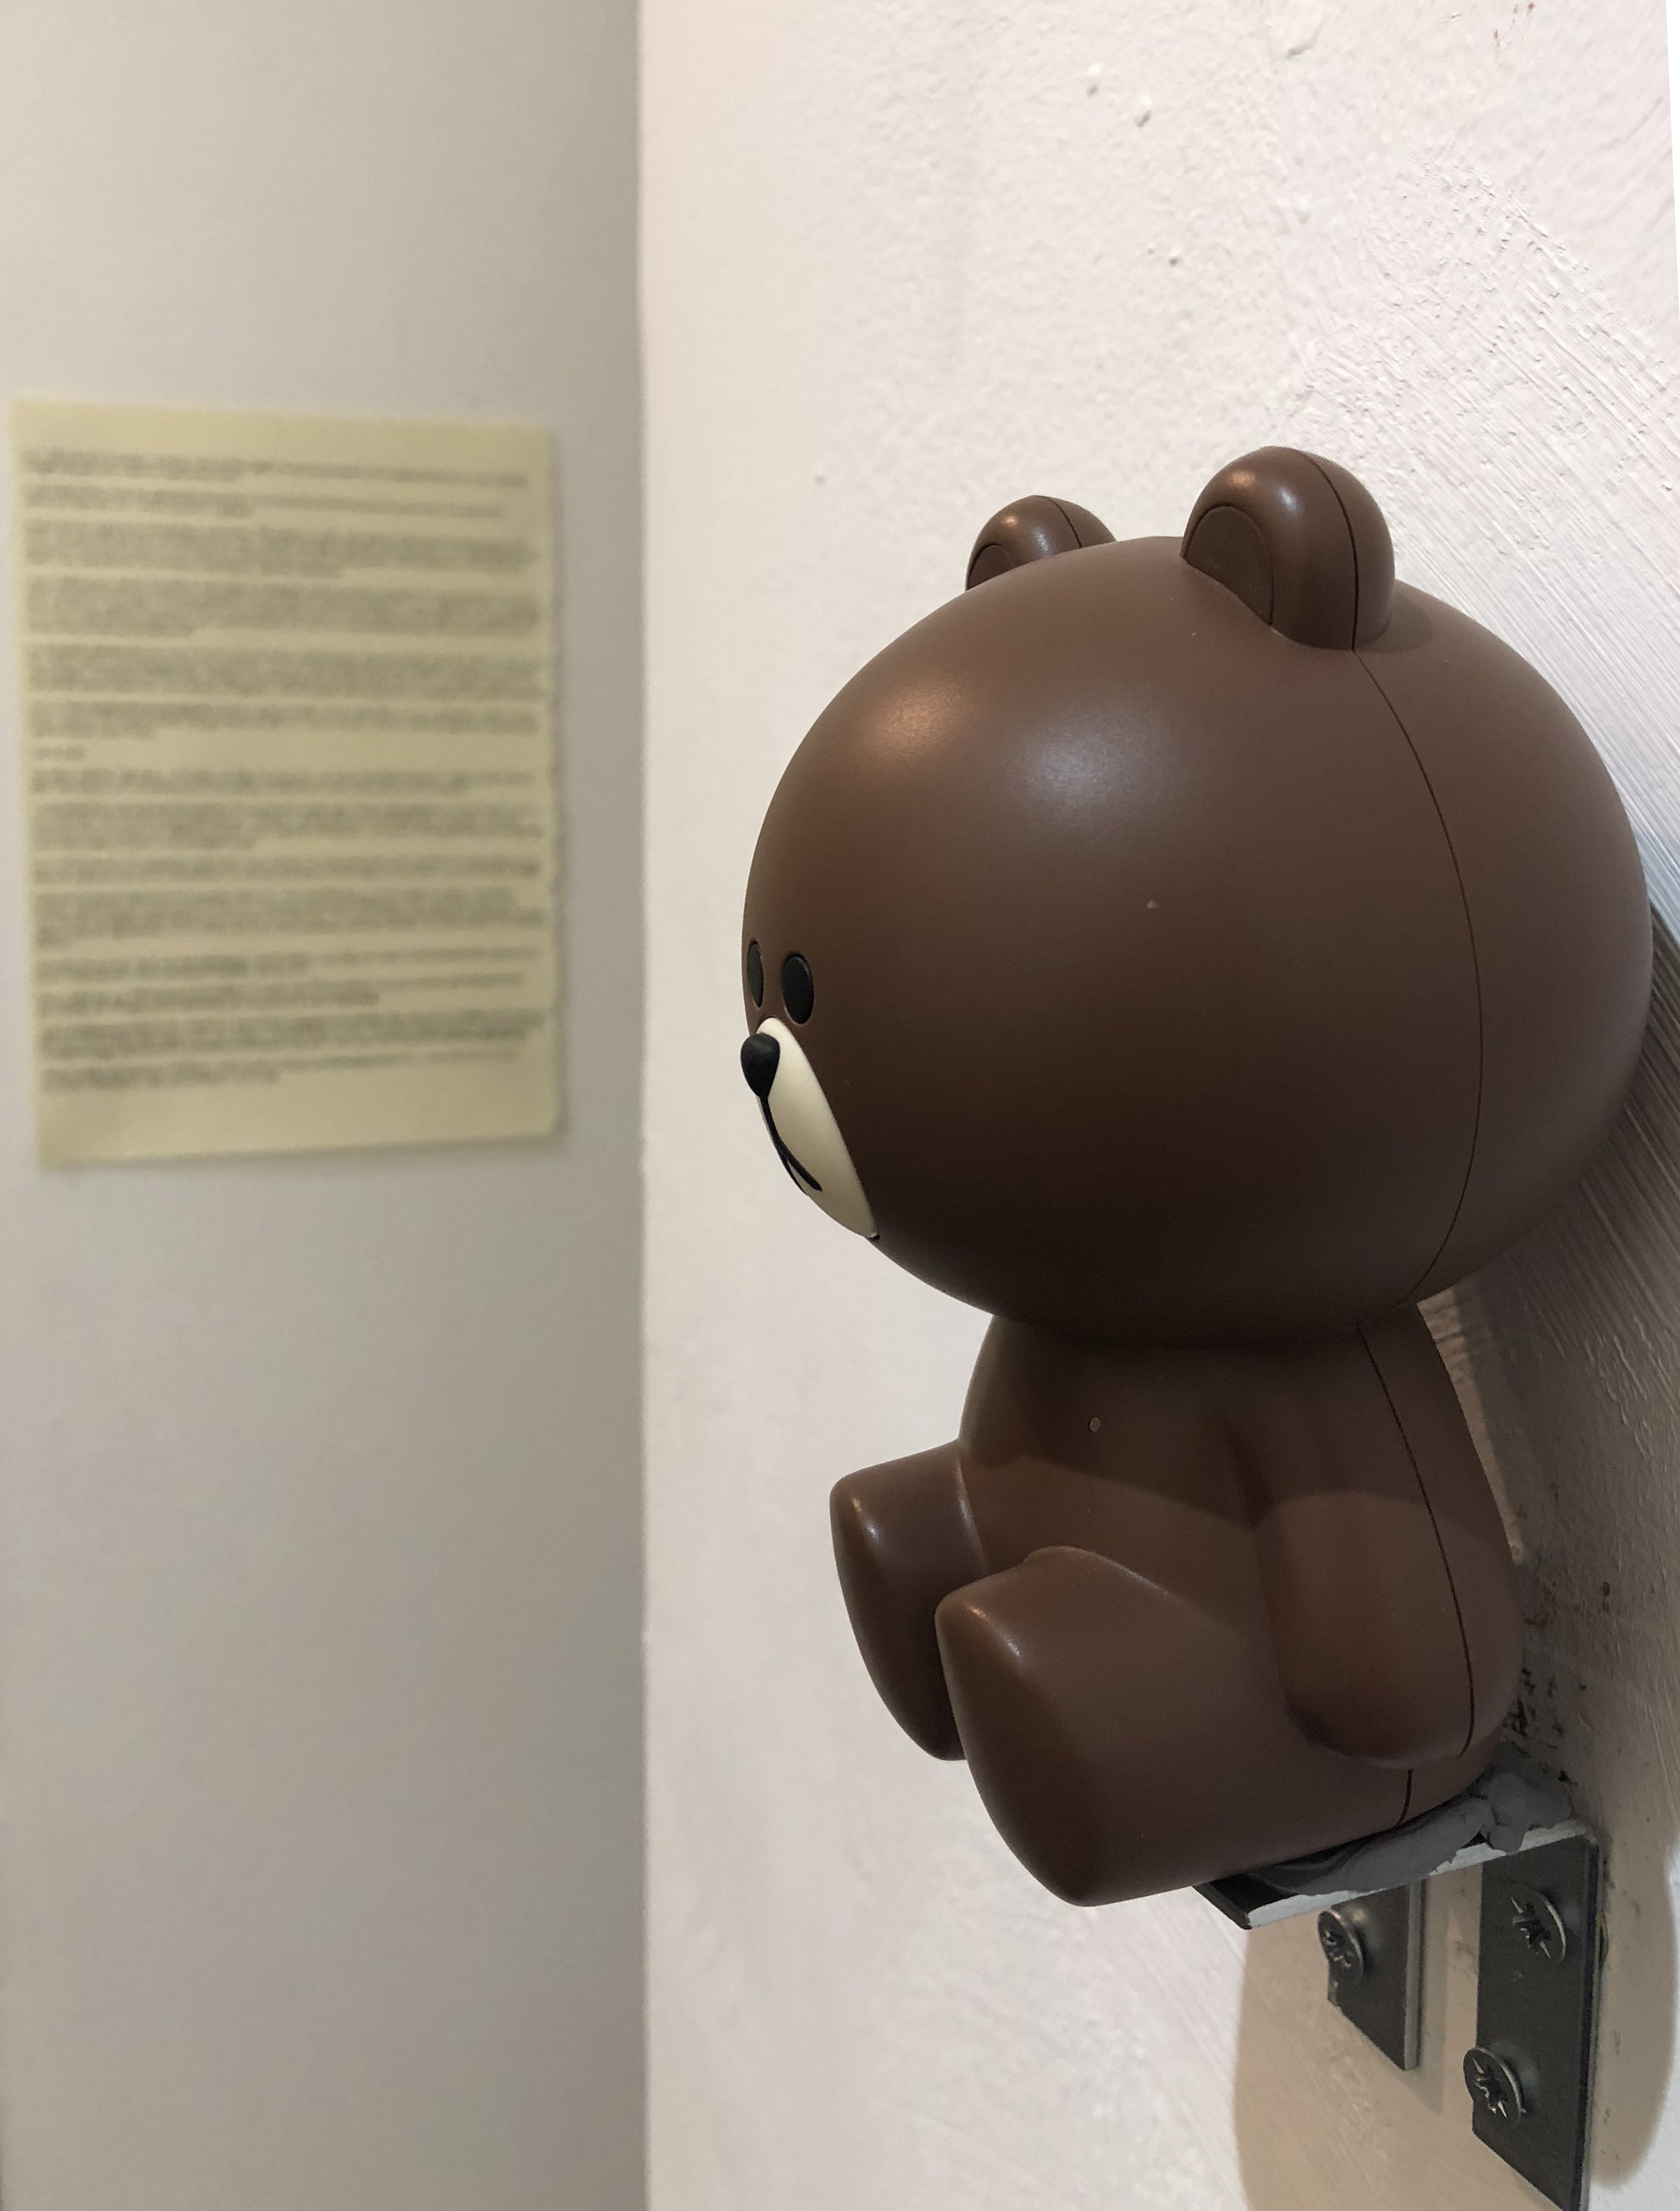 Korean toy bear speaker  Sound Installation + Handwritten Text on pullout notebook paper